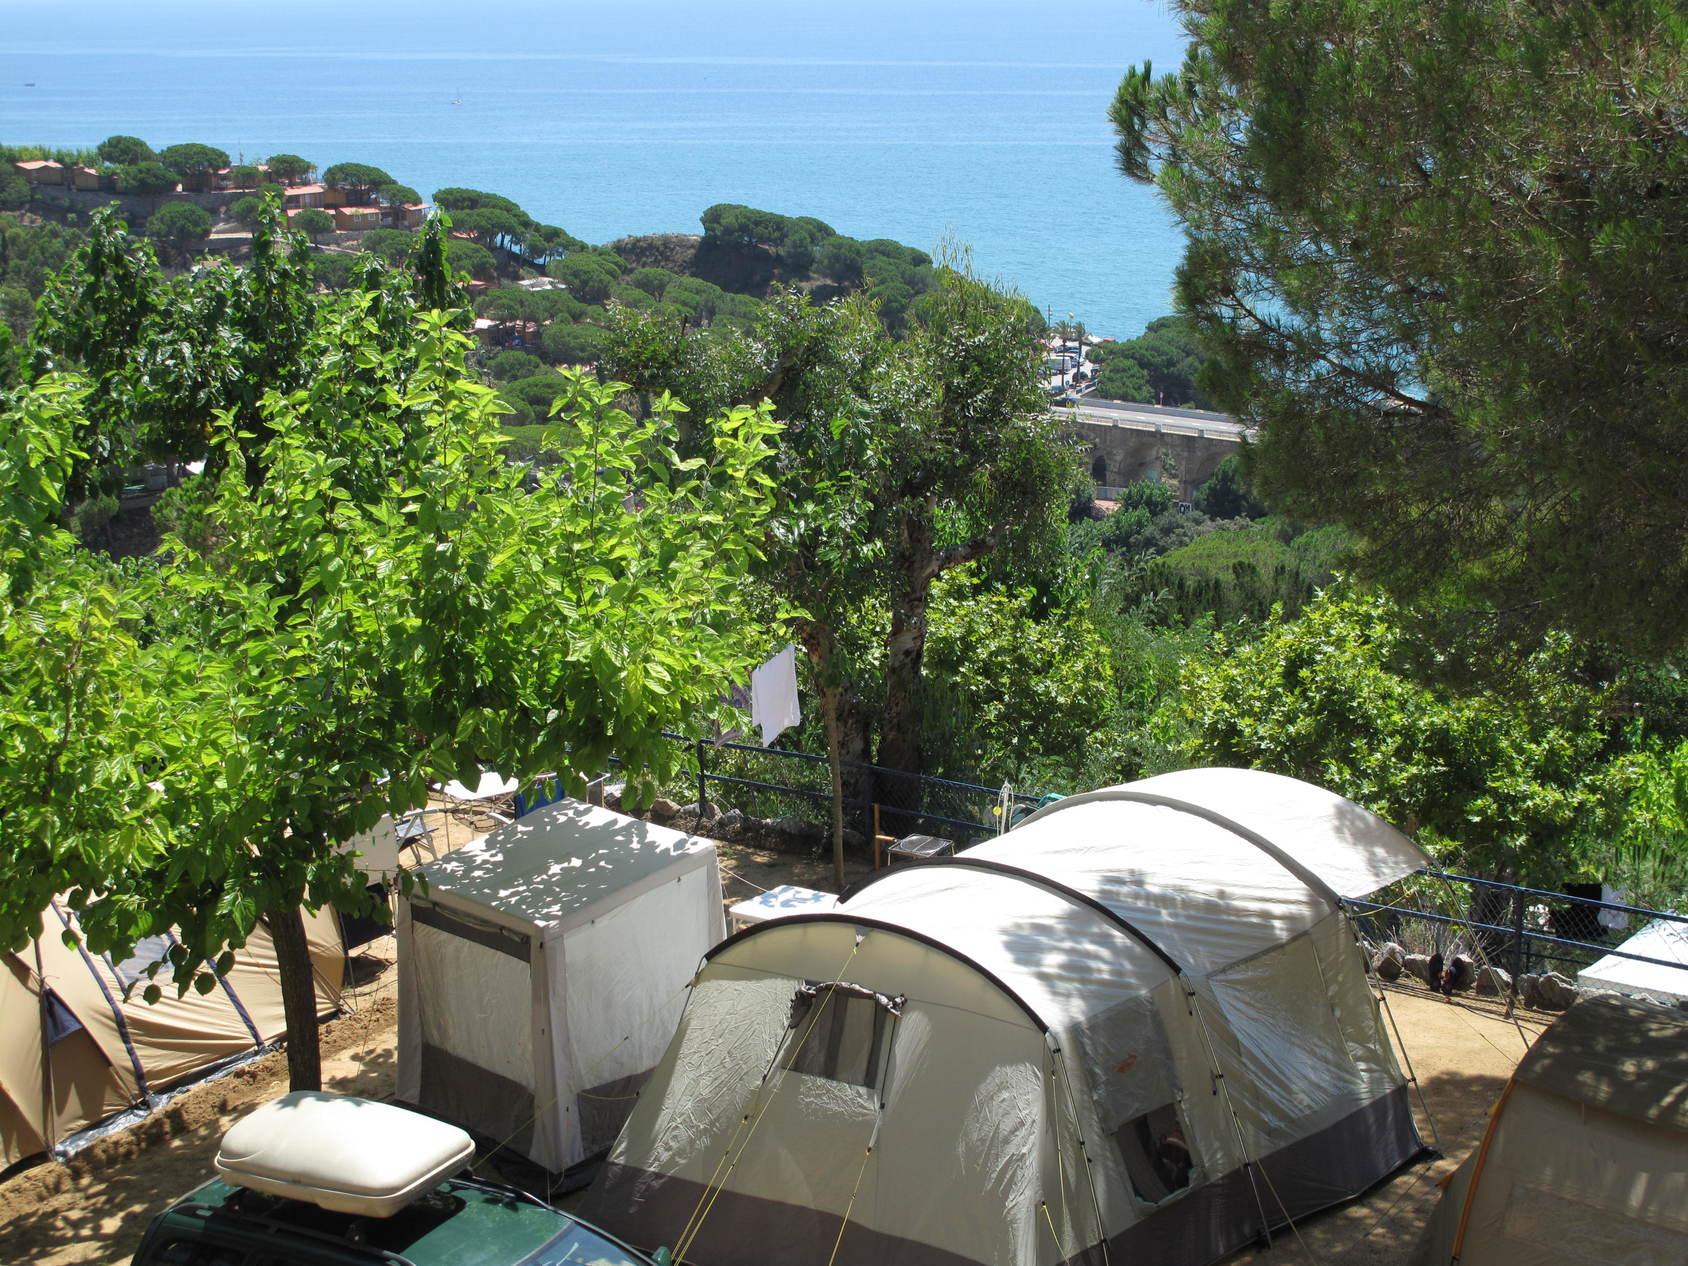 Spanje-Calella%20de%20la%20Costa-Camping%20Roca%20Grossa-ExtraLarge Campings Spanje